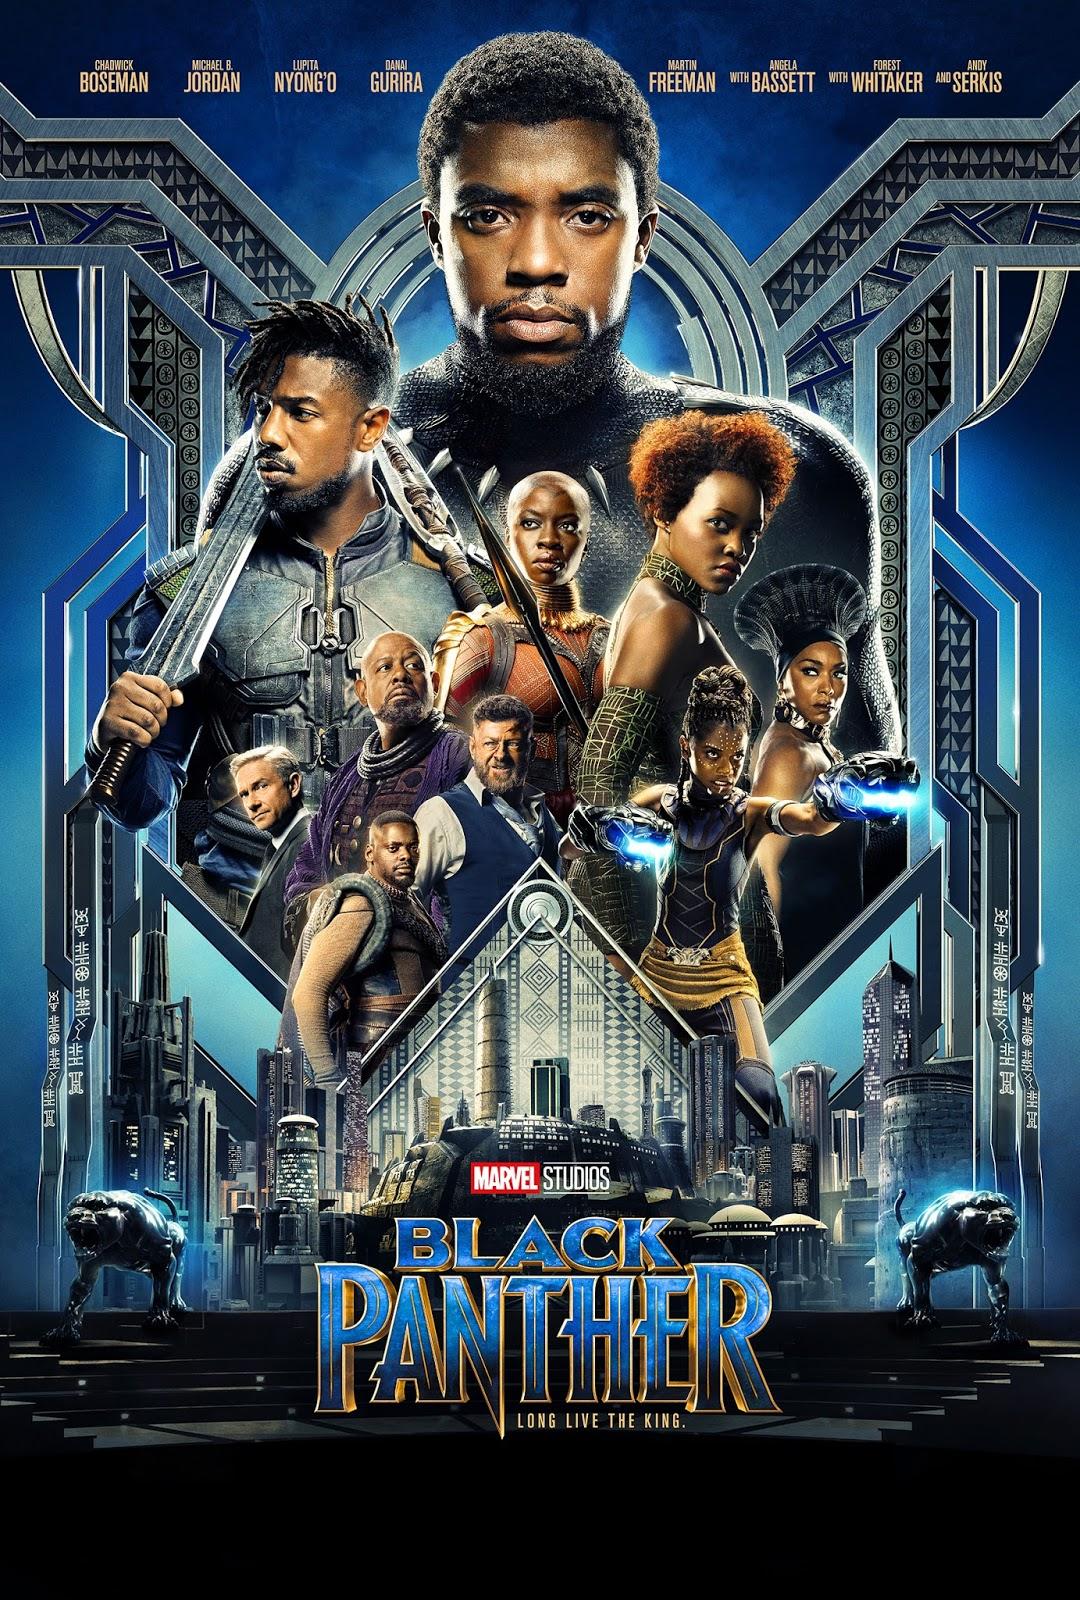 Black Panther [2018] [DVDR] [NTSC] [CUSTOM BD] [Subtitulado]